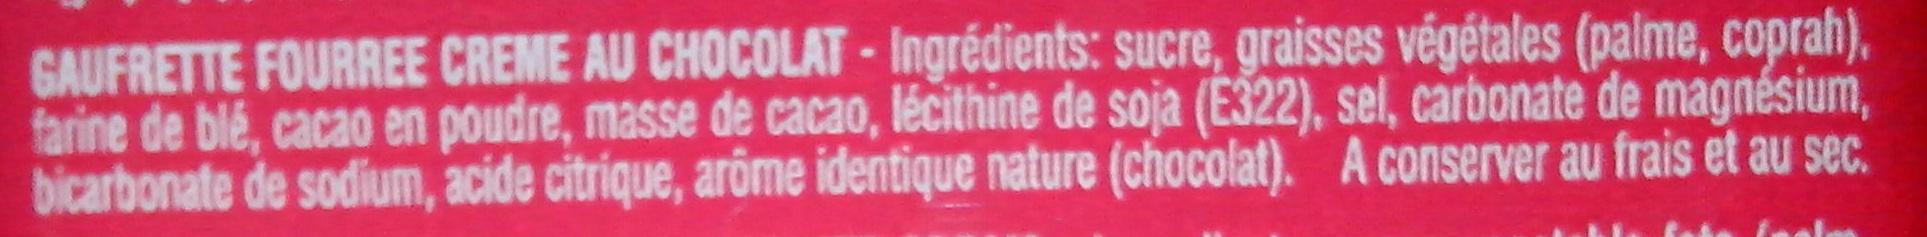 Croustina au Chocolat - المكونات - fr